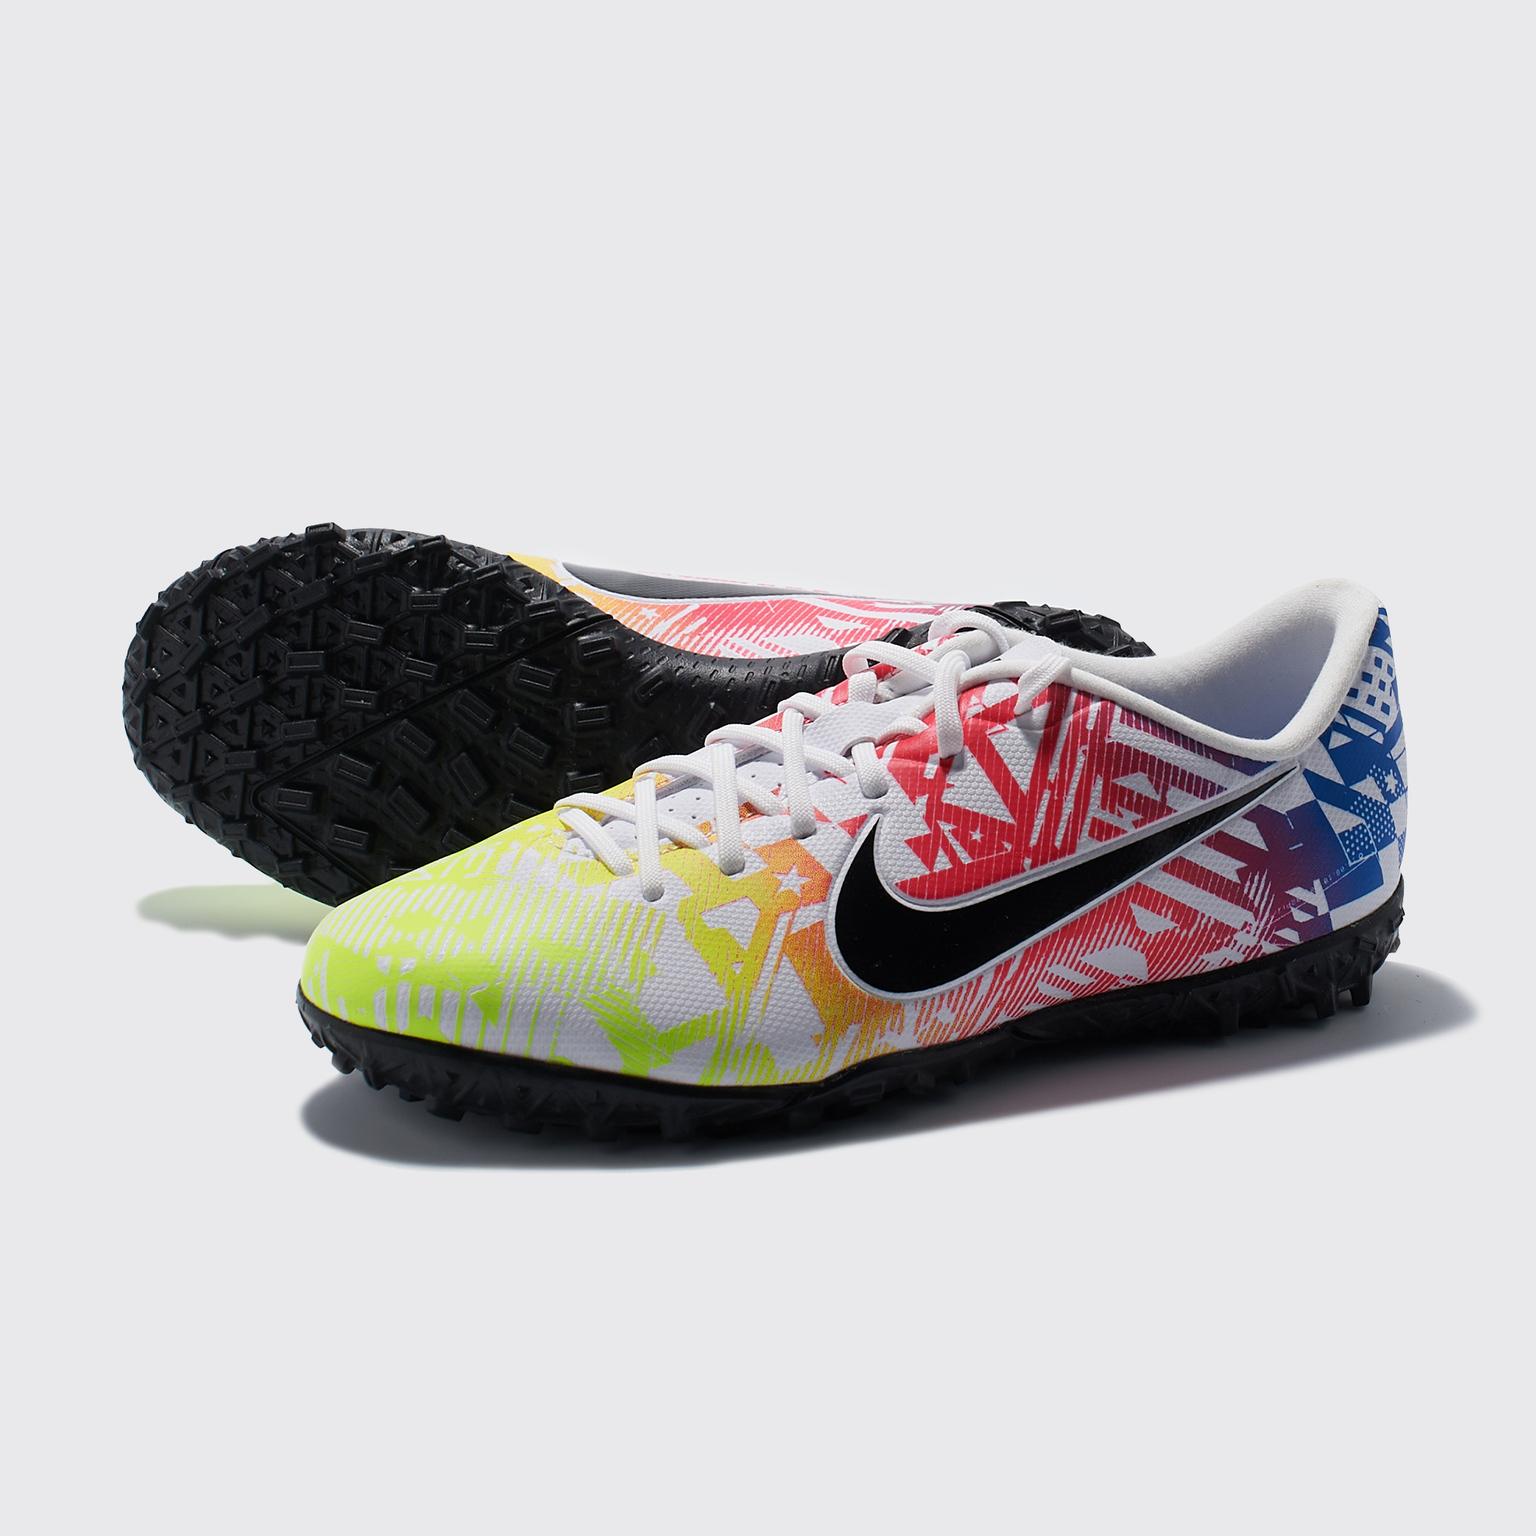 Фото - Шиповки детские Nike Vapor 13 Academy Neymar TF AT8144-104 шиповки детские nike vapor 13 academy neymar tf at8144 104